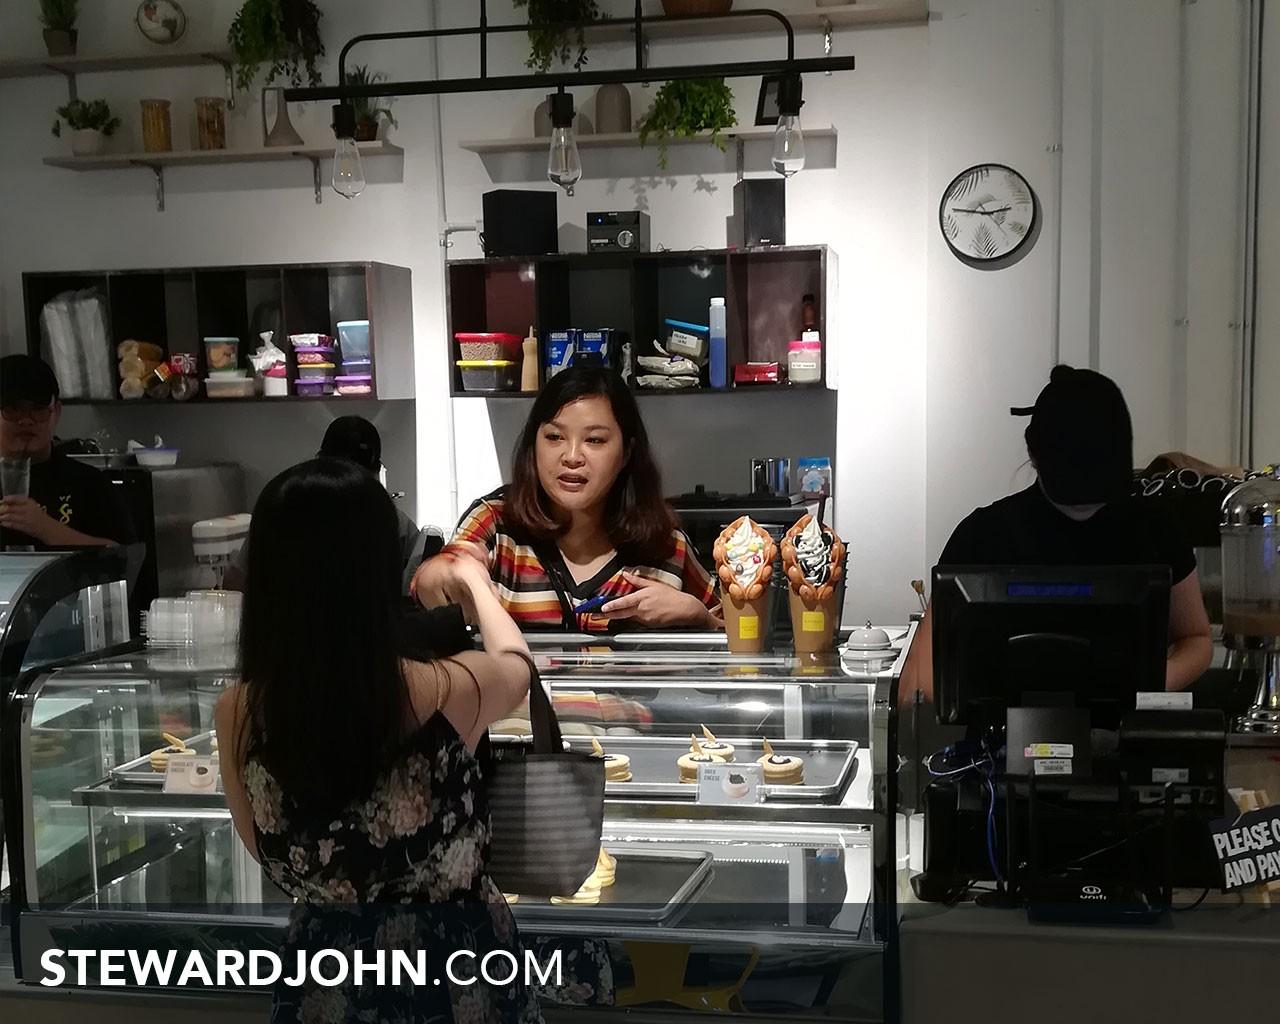 Joox cashier station